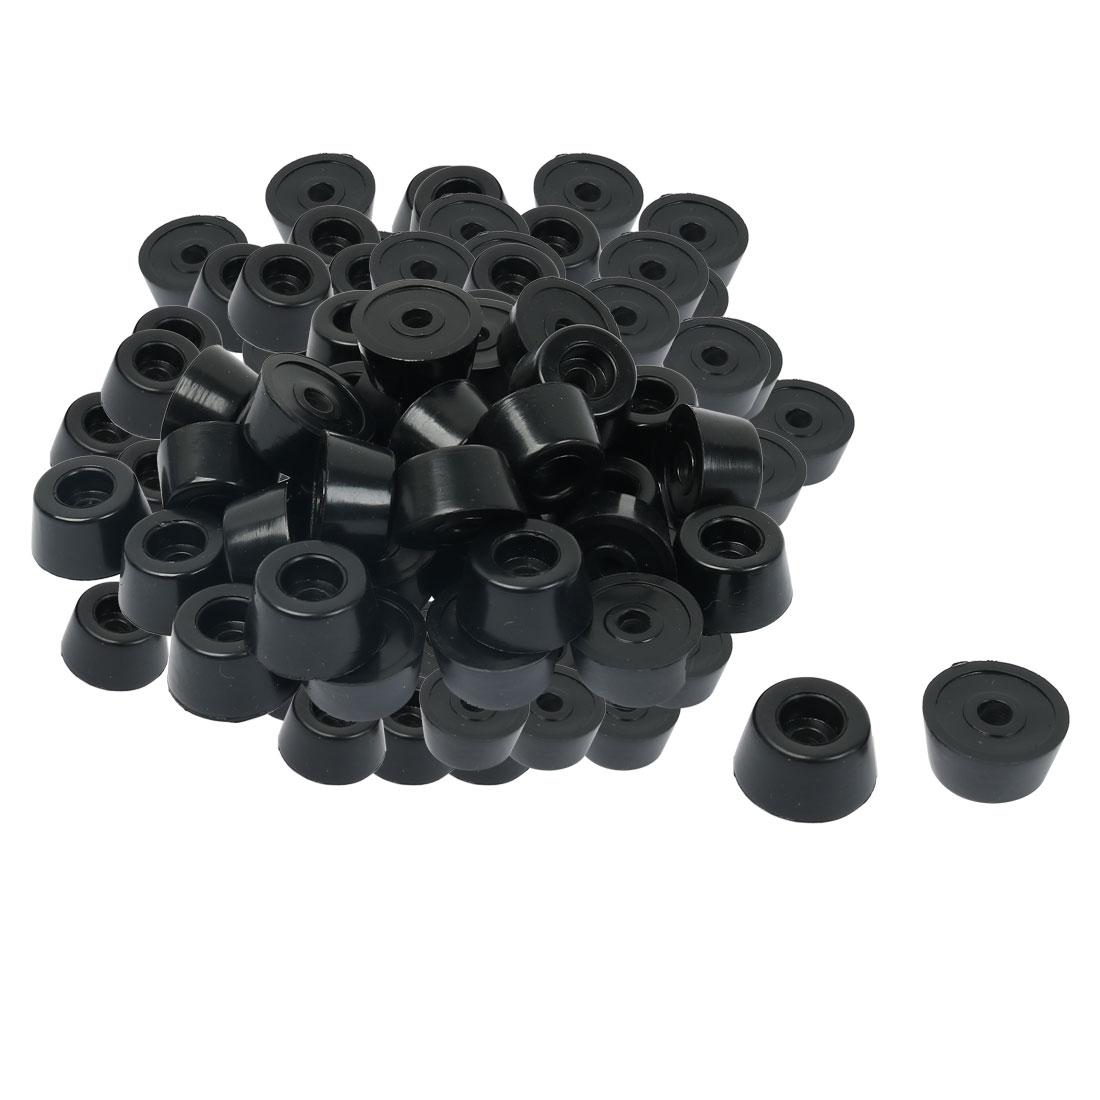 60pcs Rubber Feet Bumper Speaker Floor Protector Table Leg Pads, D19x15xH10.5mm - image 7 de 7